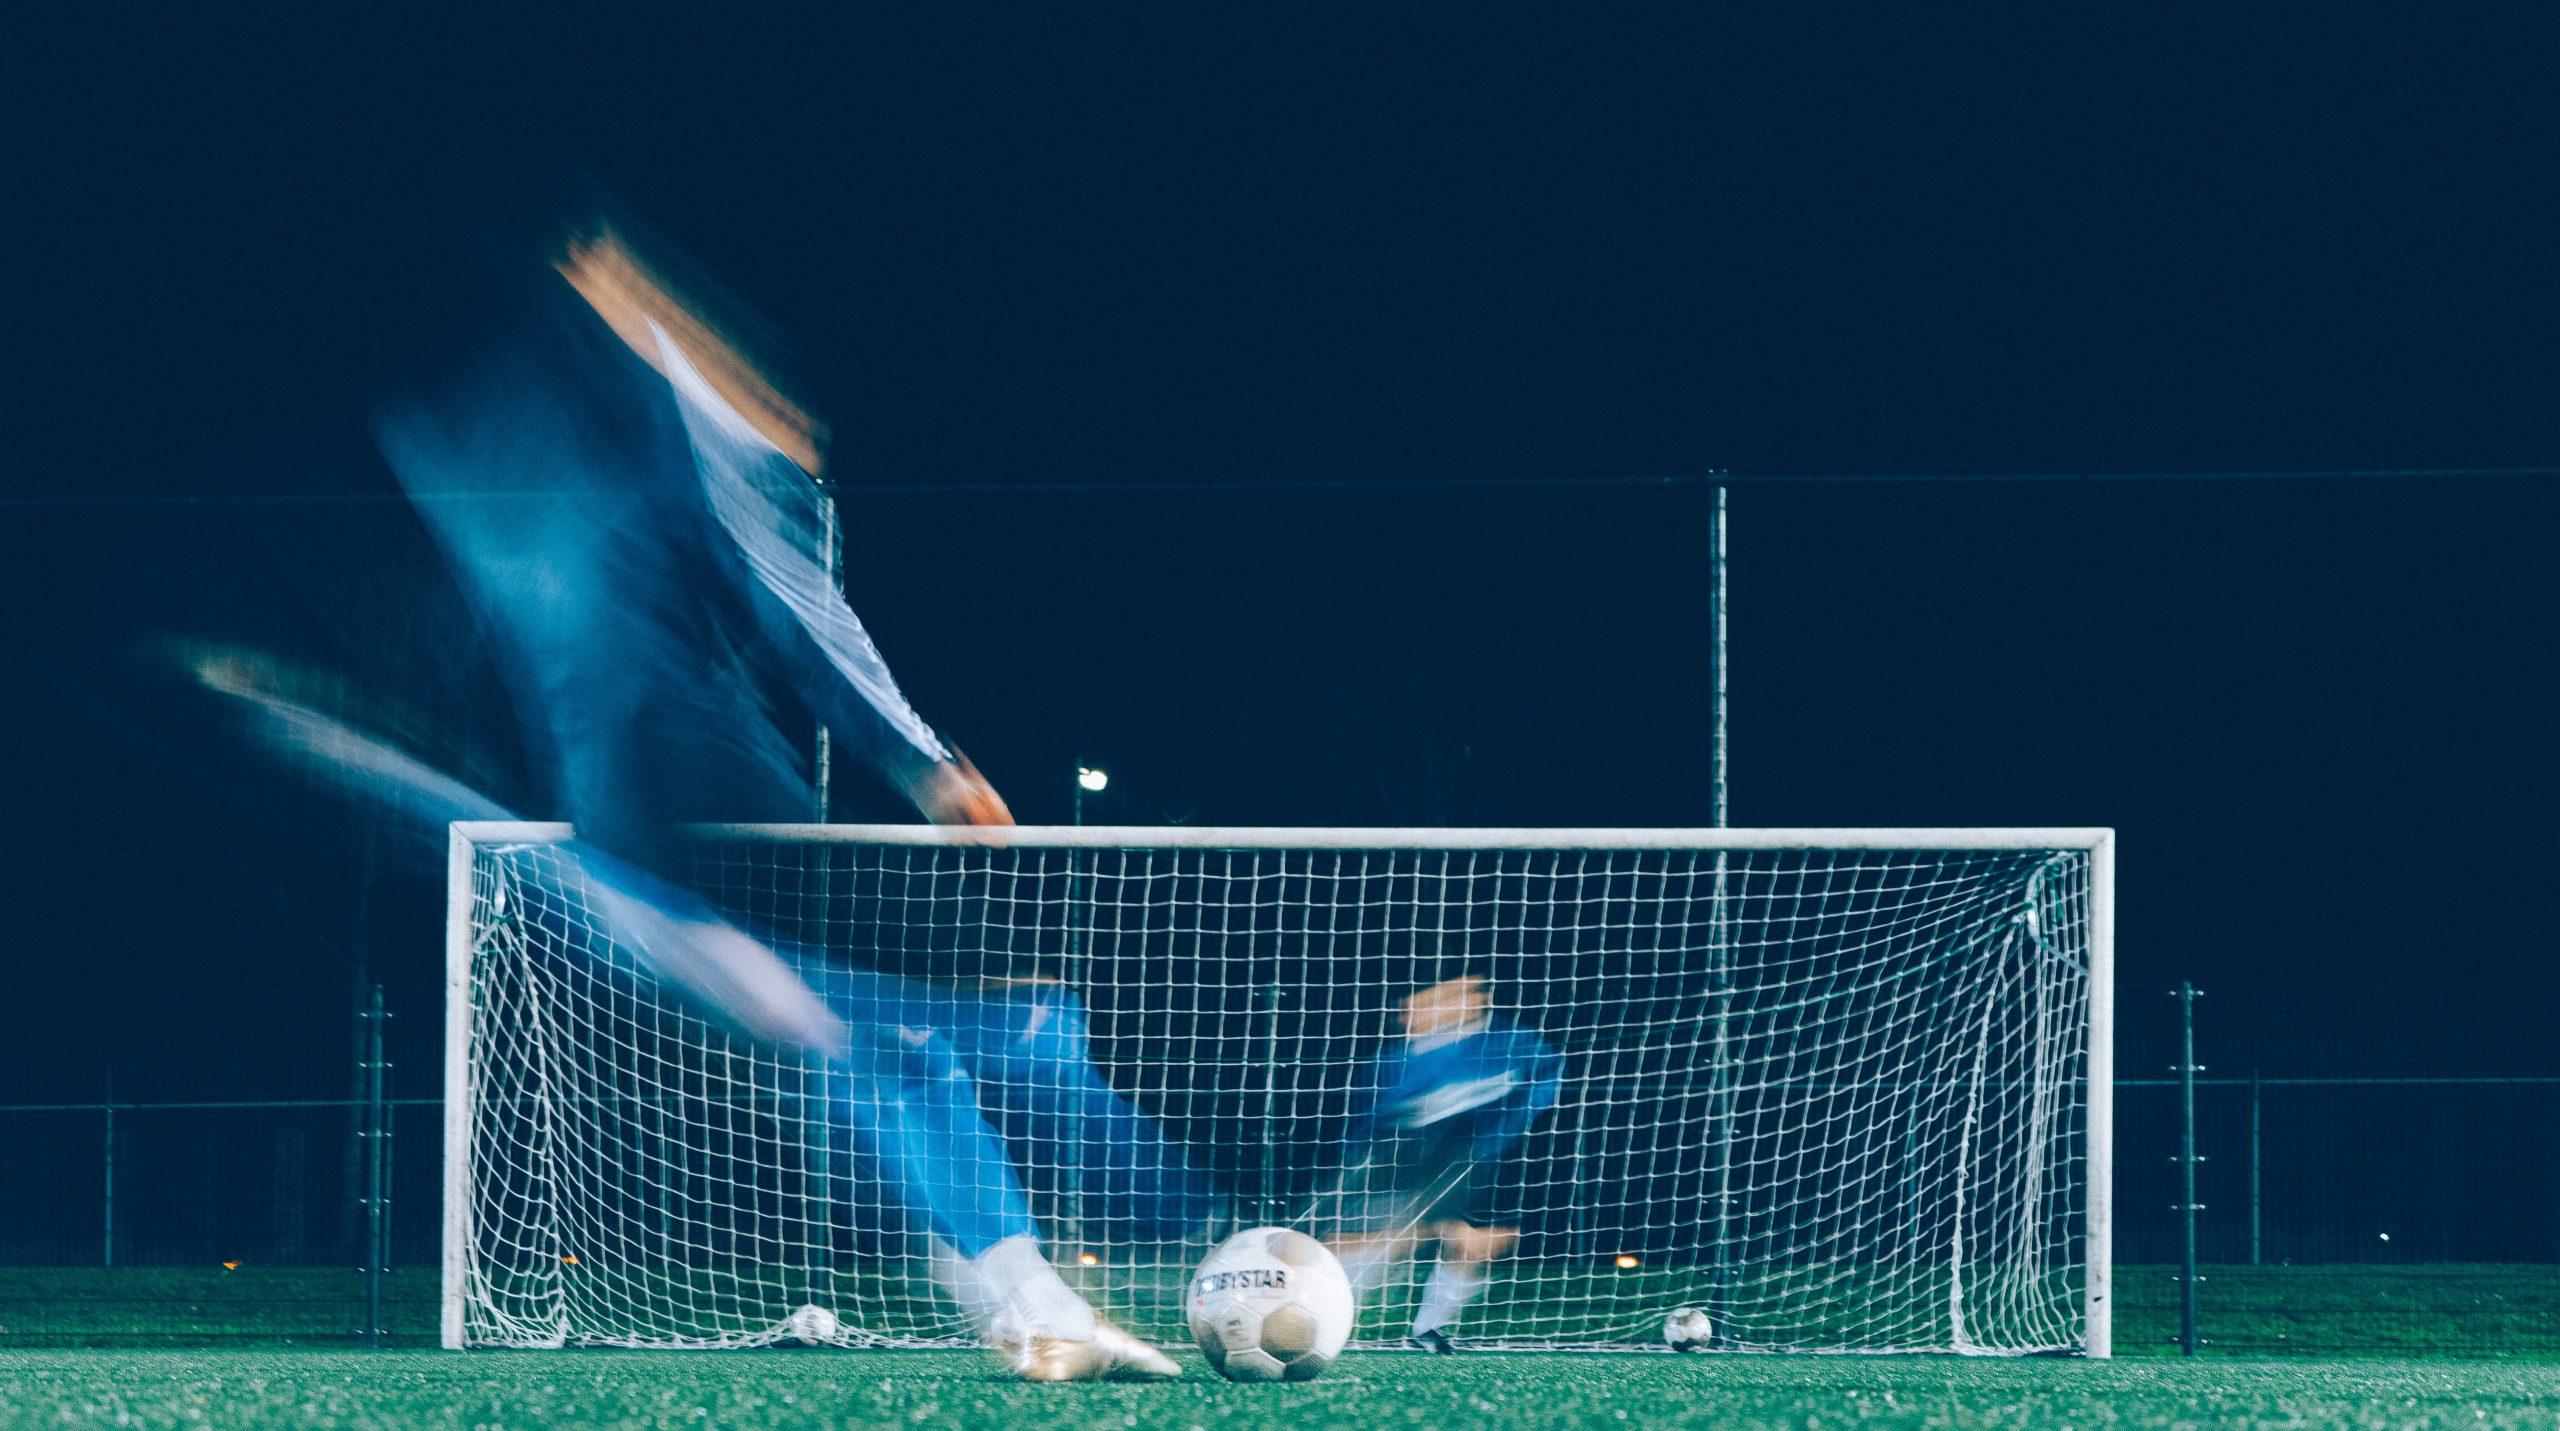 curiosidades sobre esporte recorde de gols contra